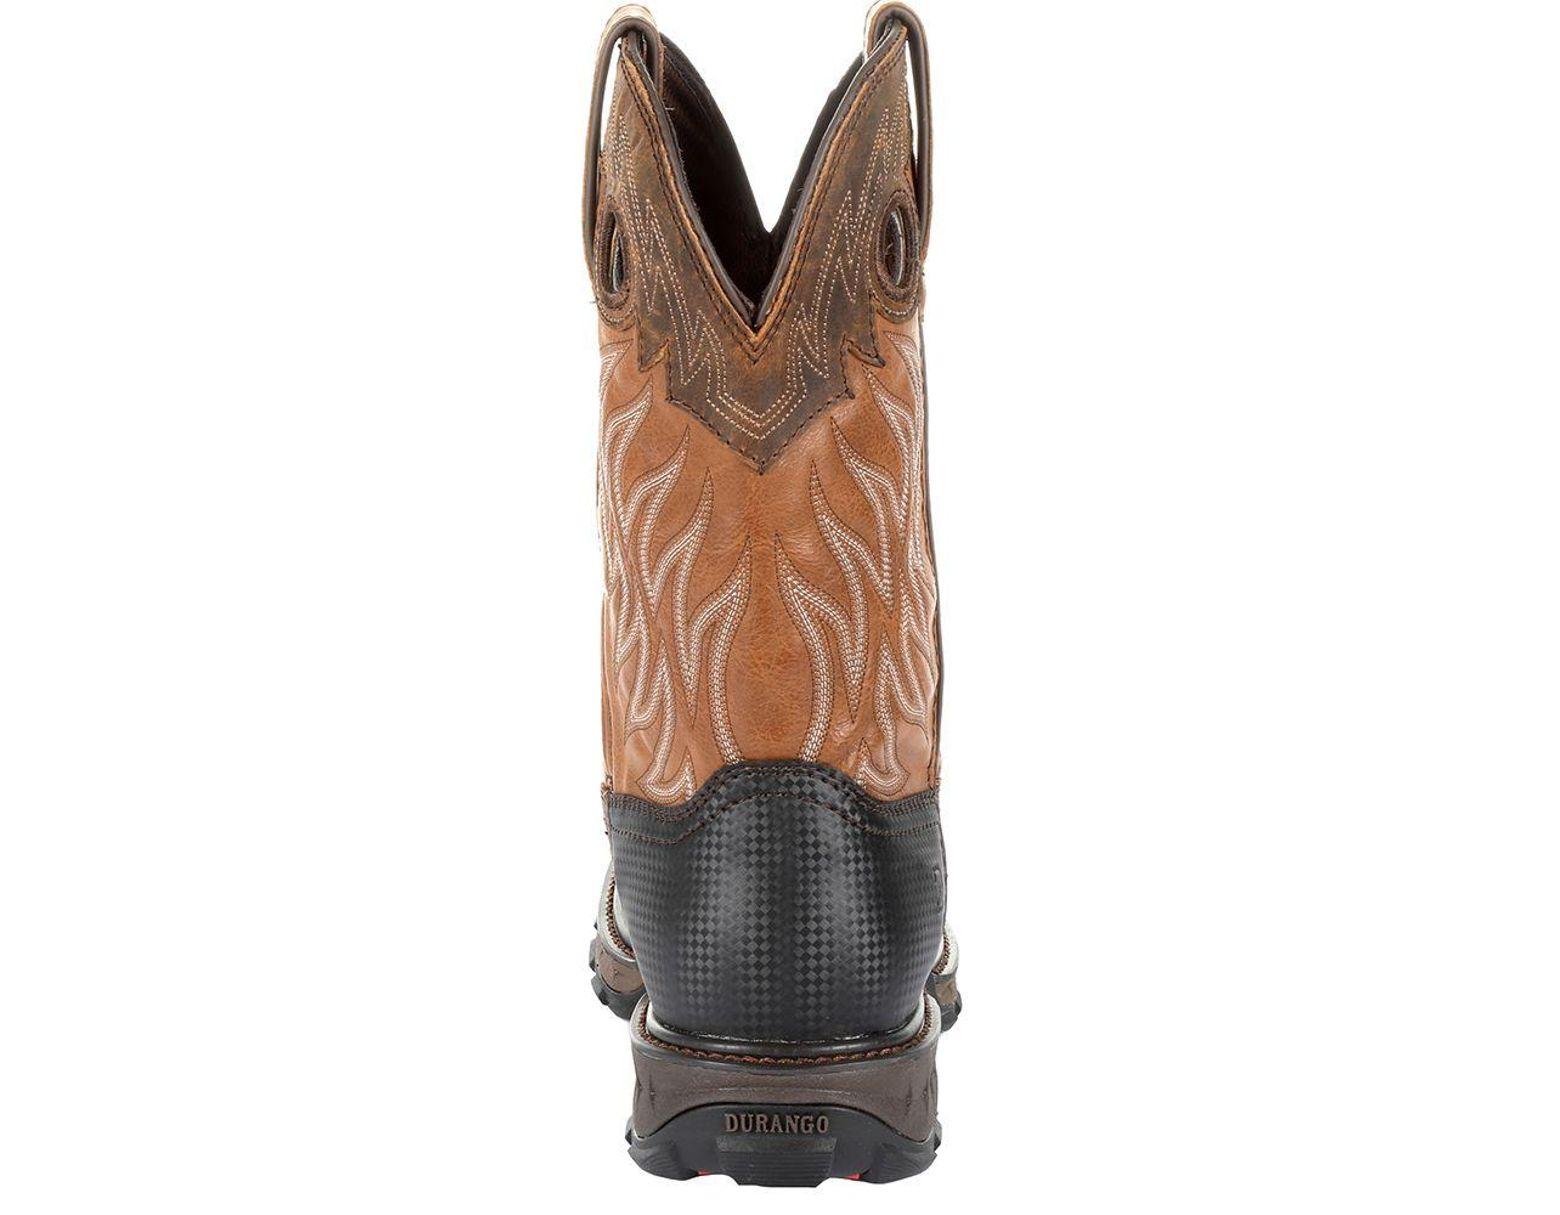 2394137eb57 Durango Maverick Xp Steel Toe Waterproof Western Work Boot in Brown ...